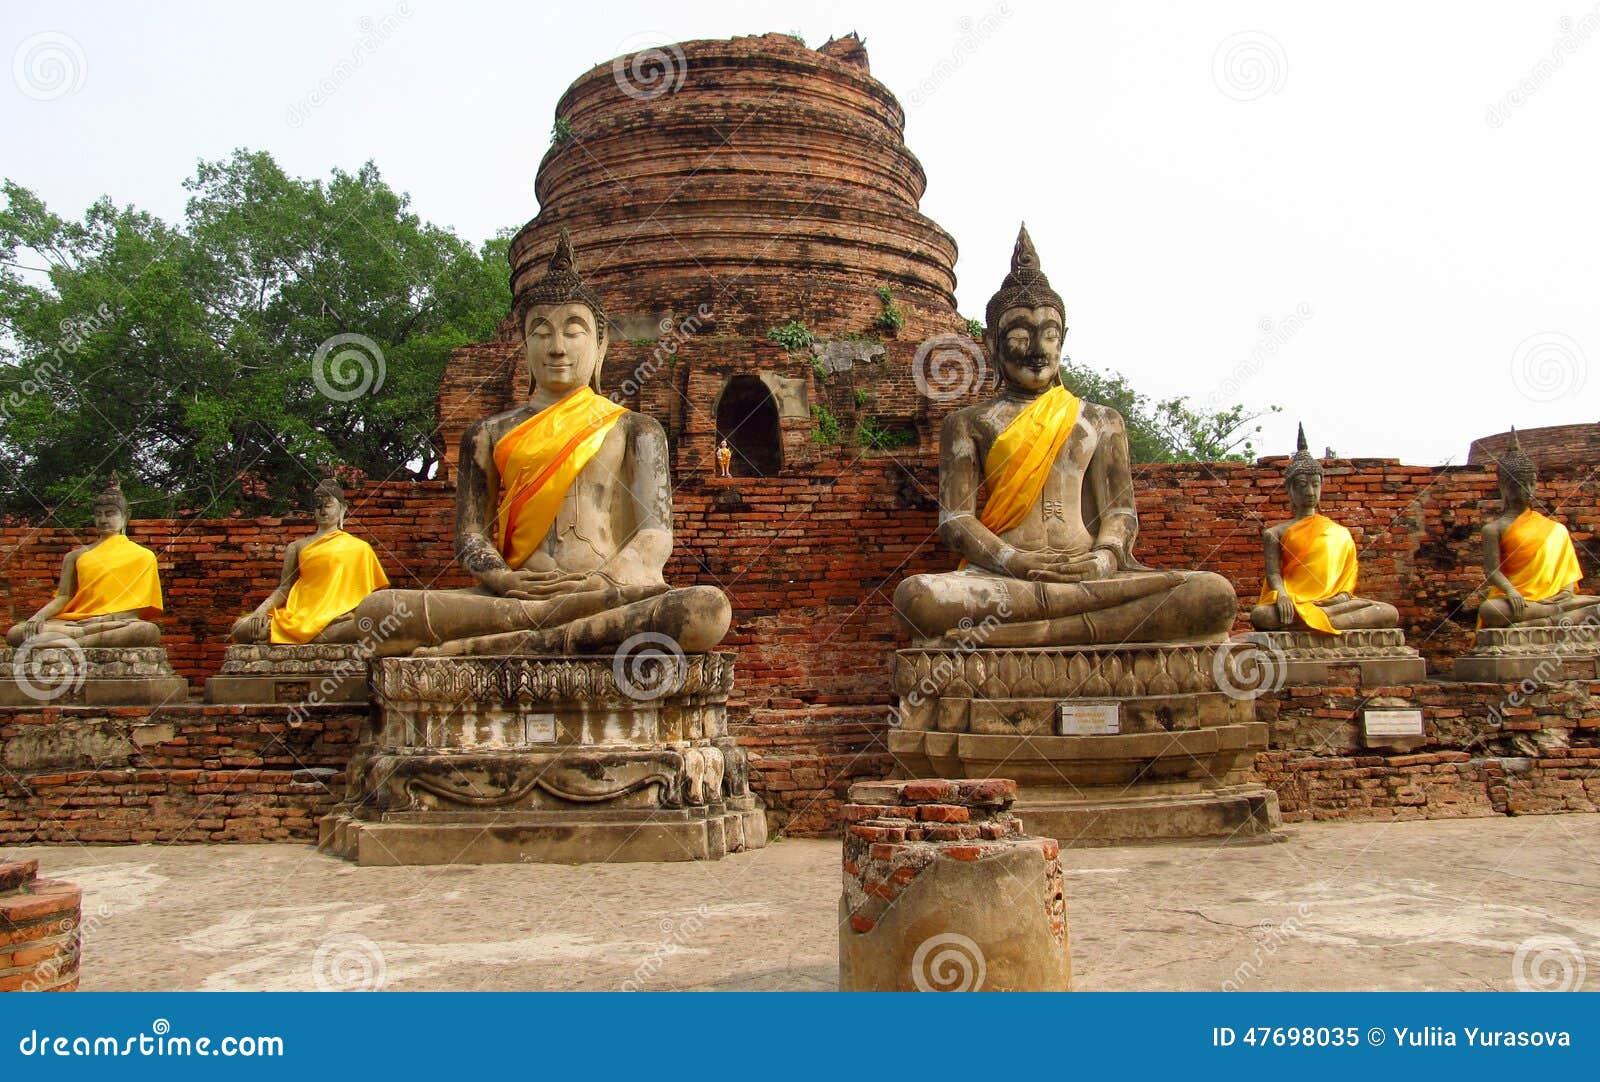 Ayutthaya Ancient City Ruins In Thailand  Buddha Statues